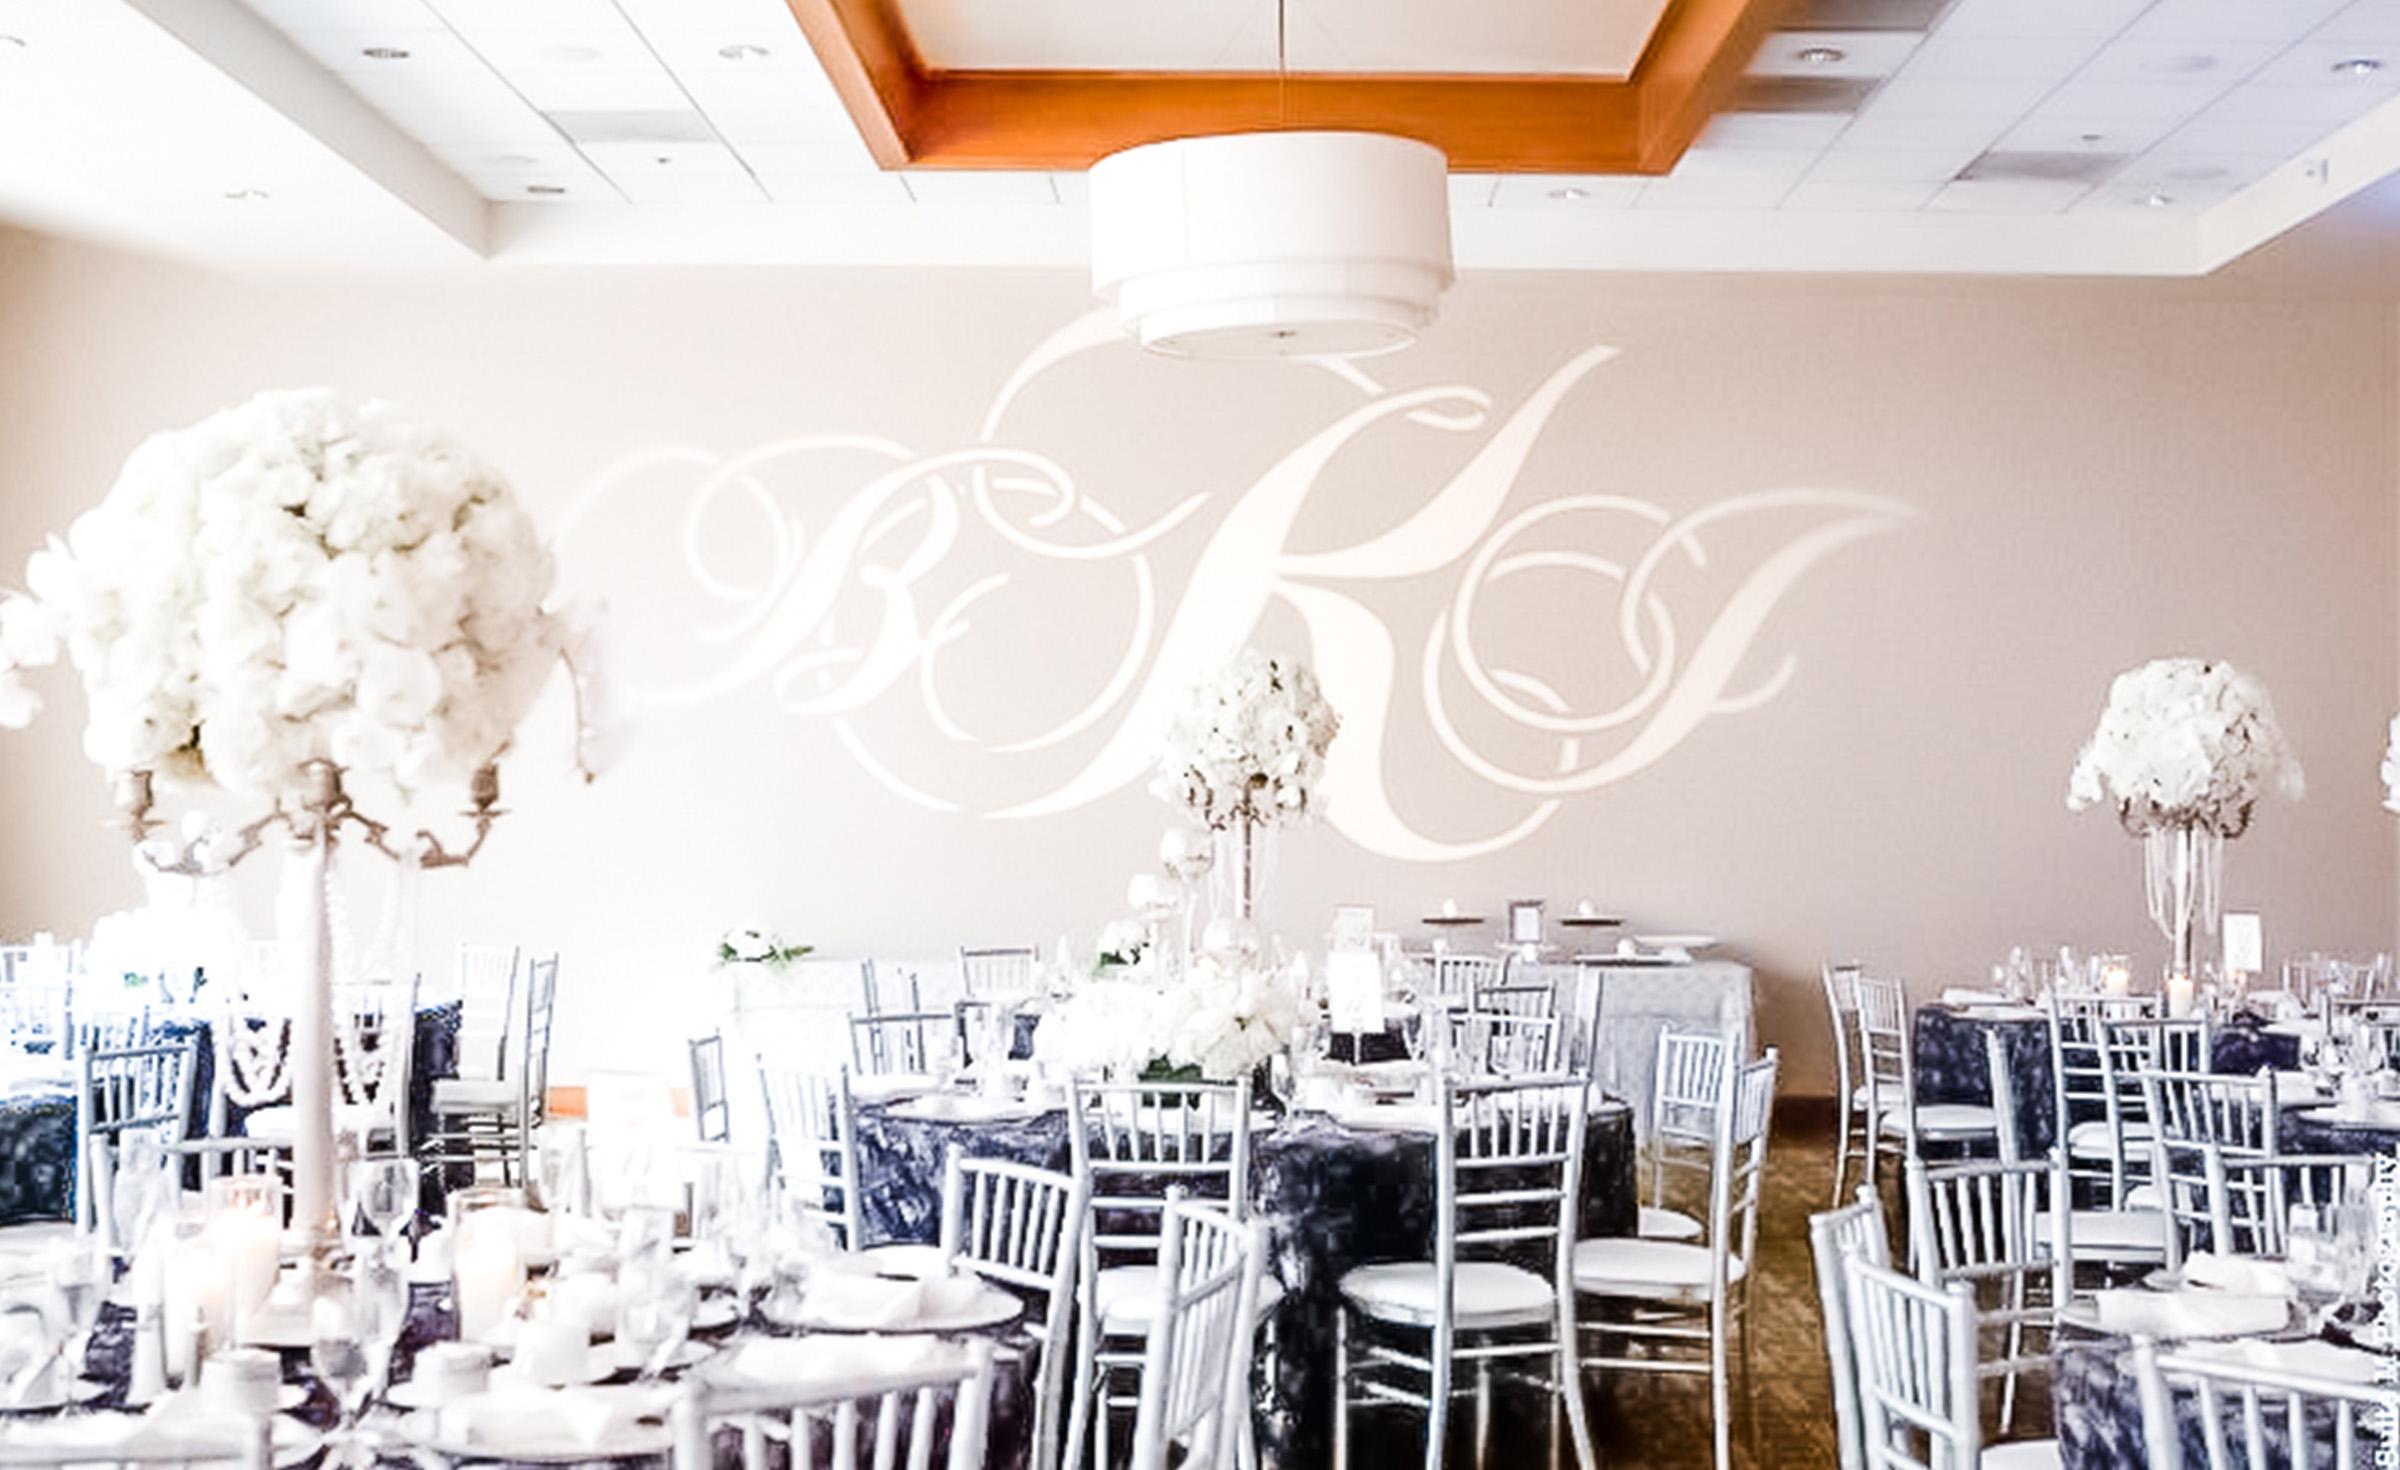 Ballroom - Rio Hondo - Downey, California - Los Angeles County - Wedgewood  Weddings